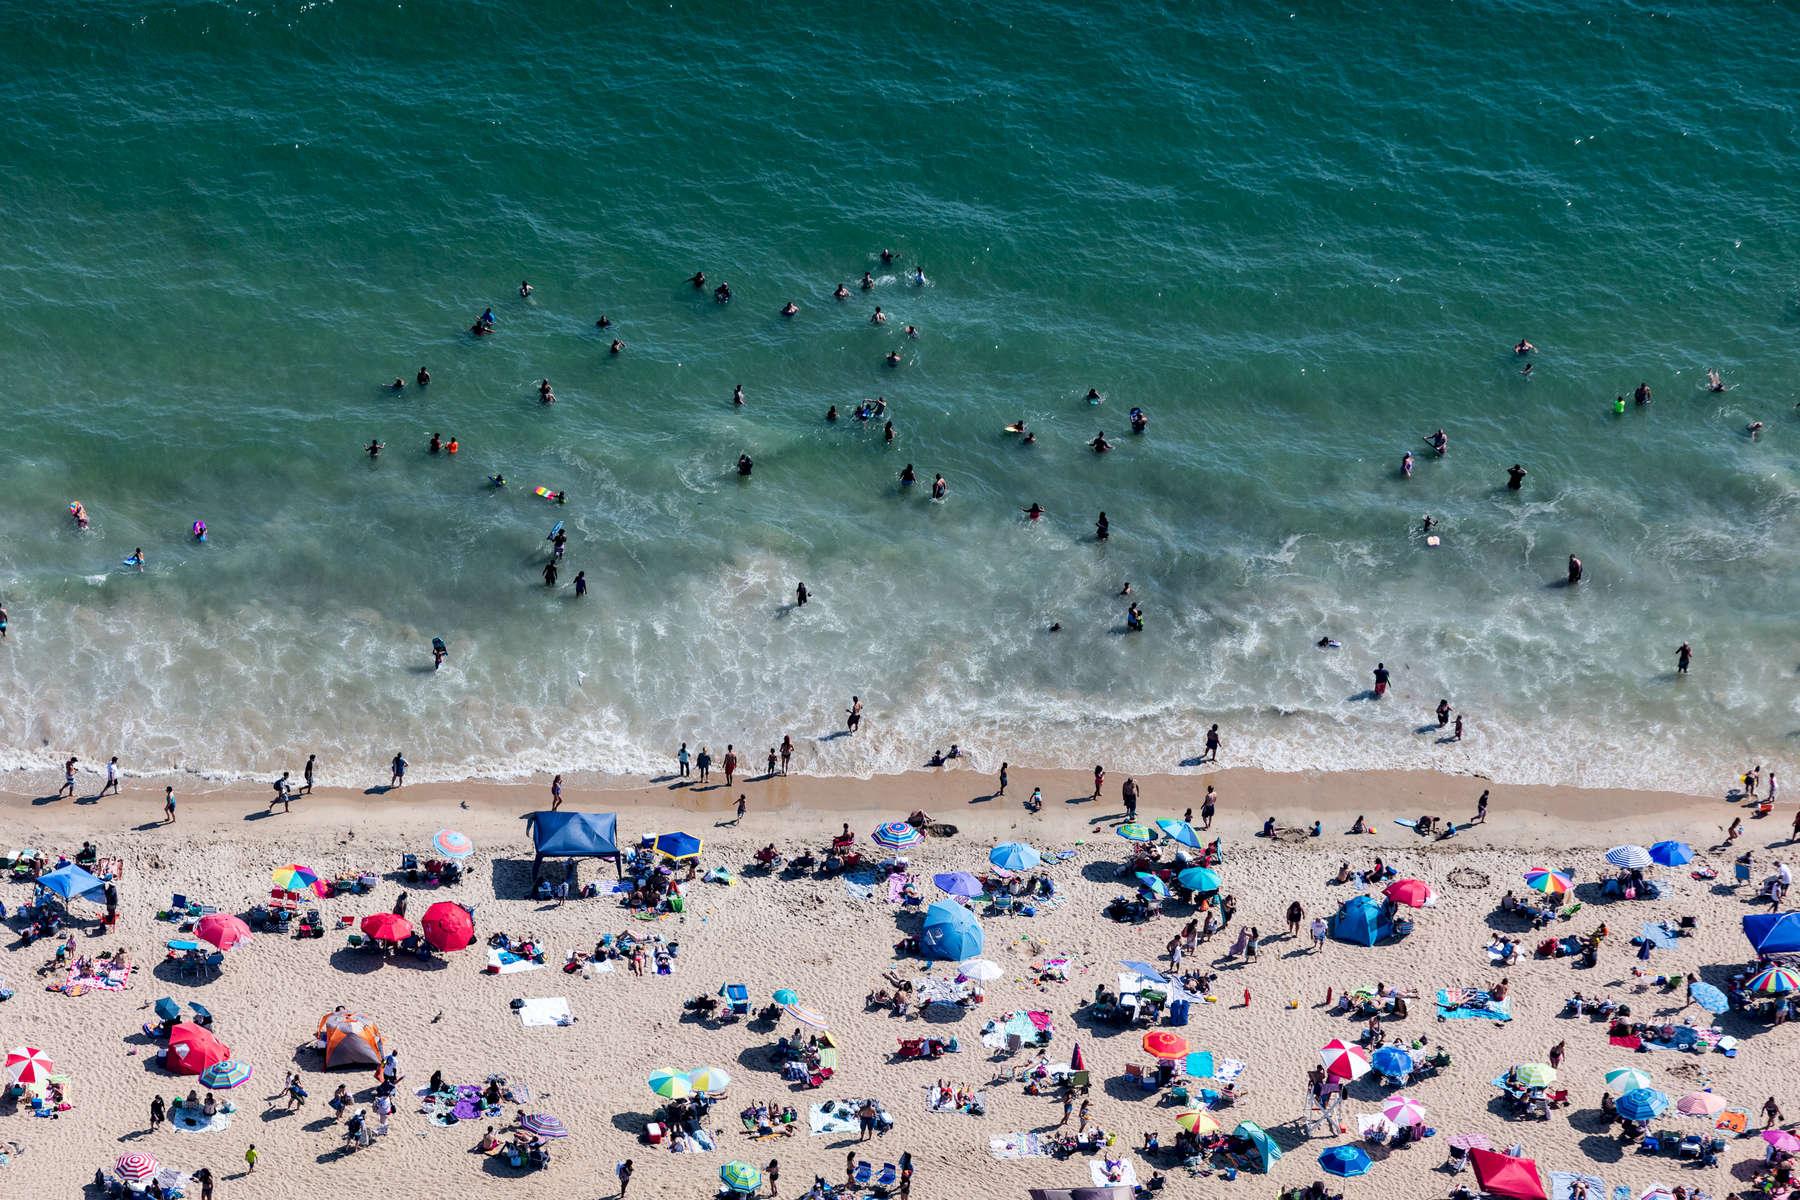 Misquamicut Beach, Westerly, Rhode Island 2018 (180903-0042)